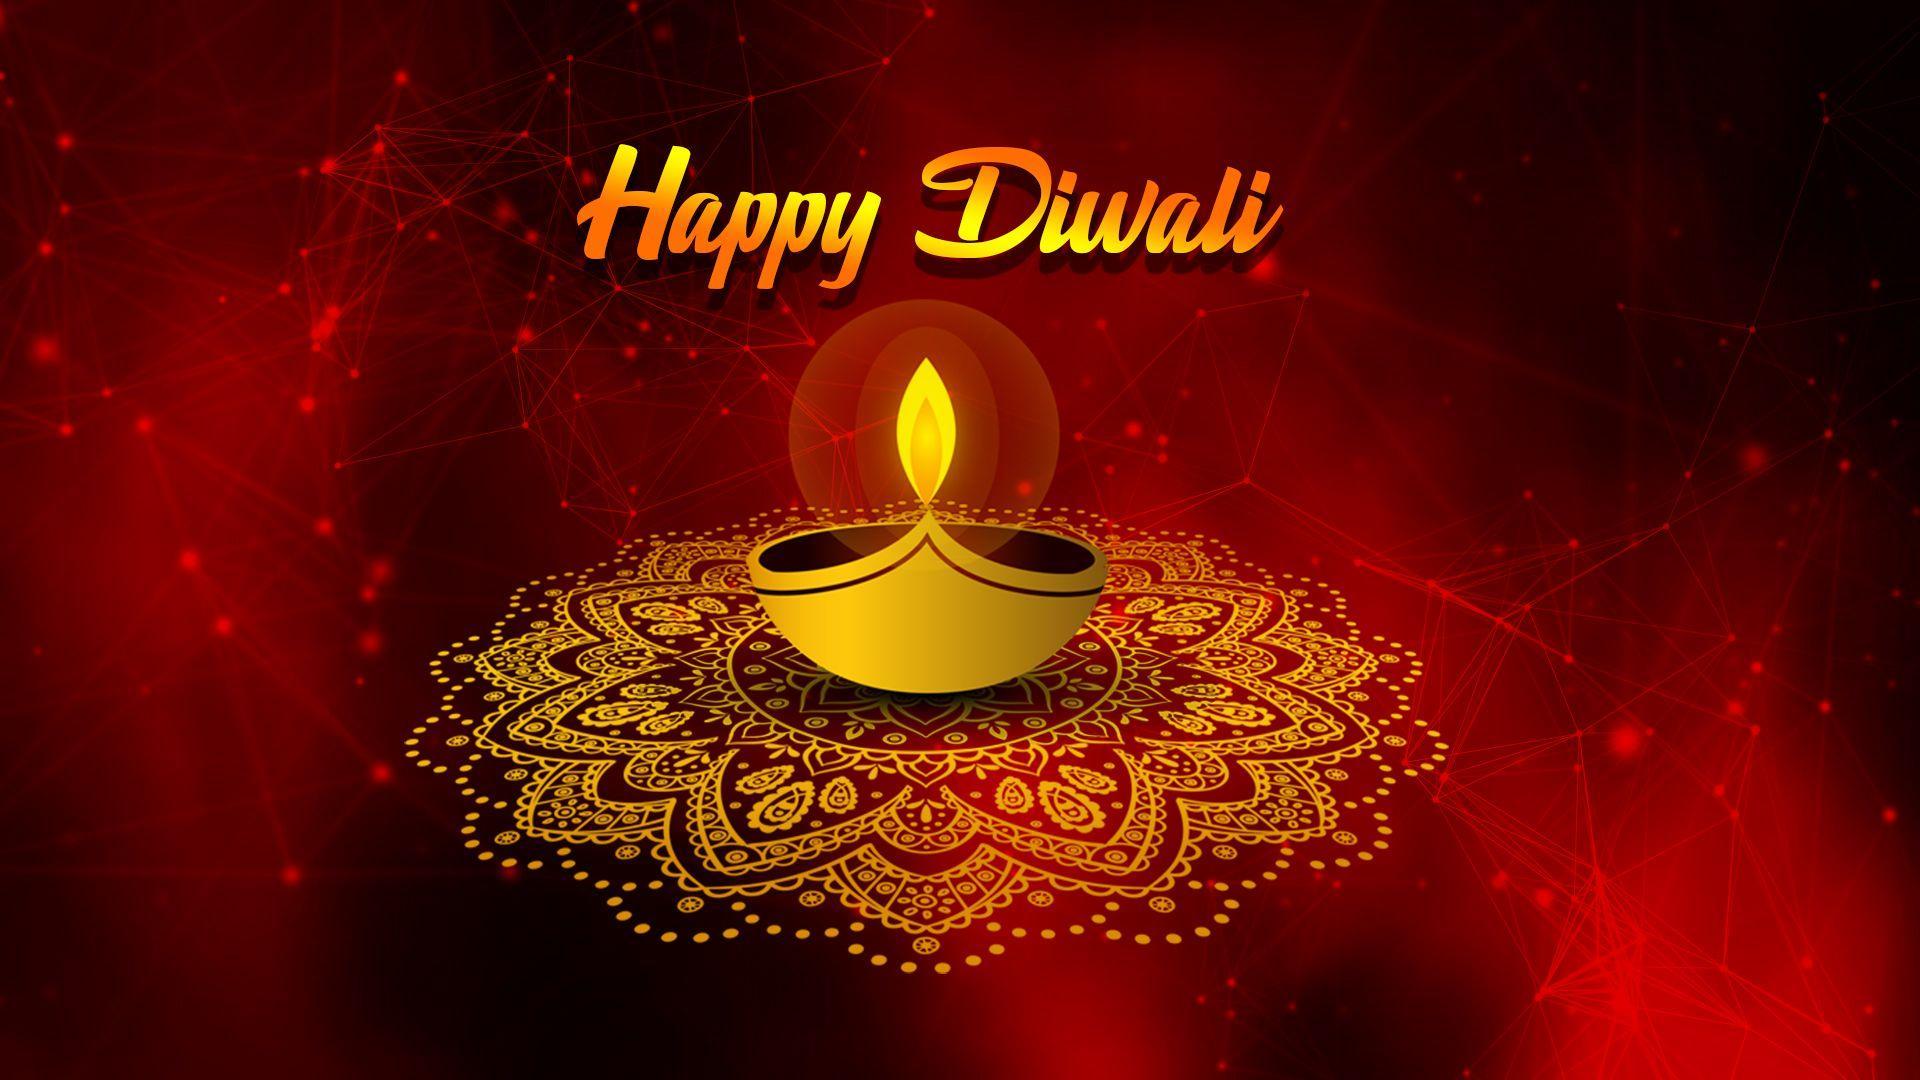 Happy Diwali Wallpapers Top Free Happy Diwali Backgrounds